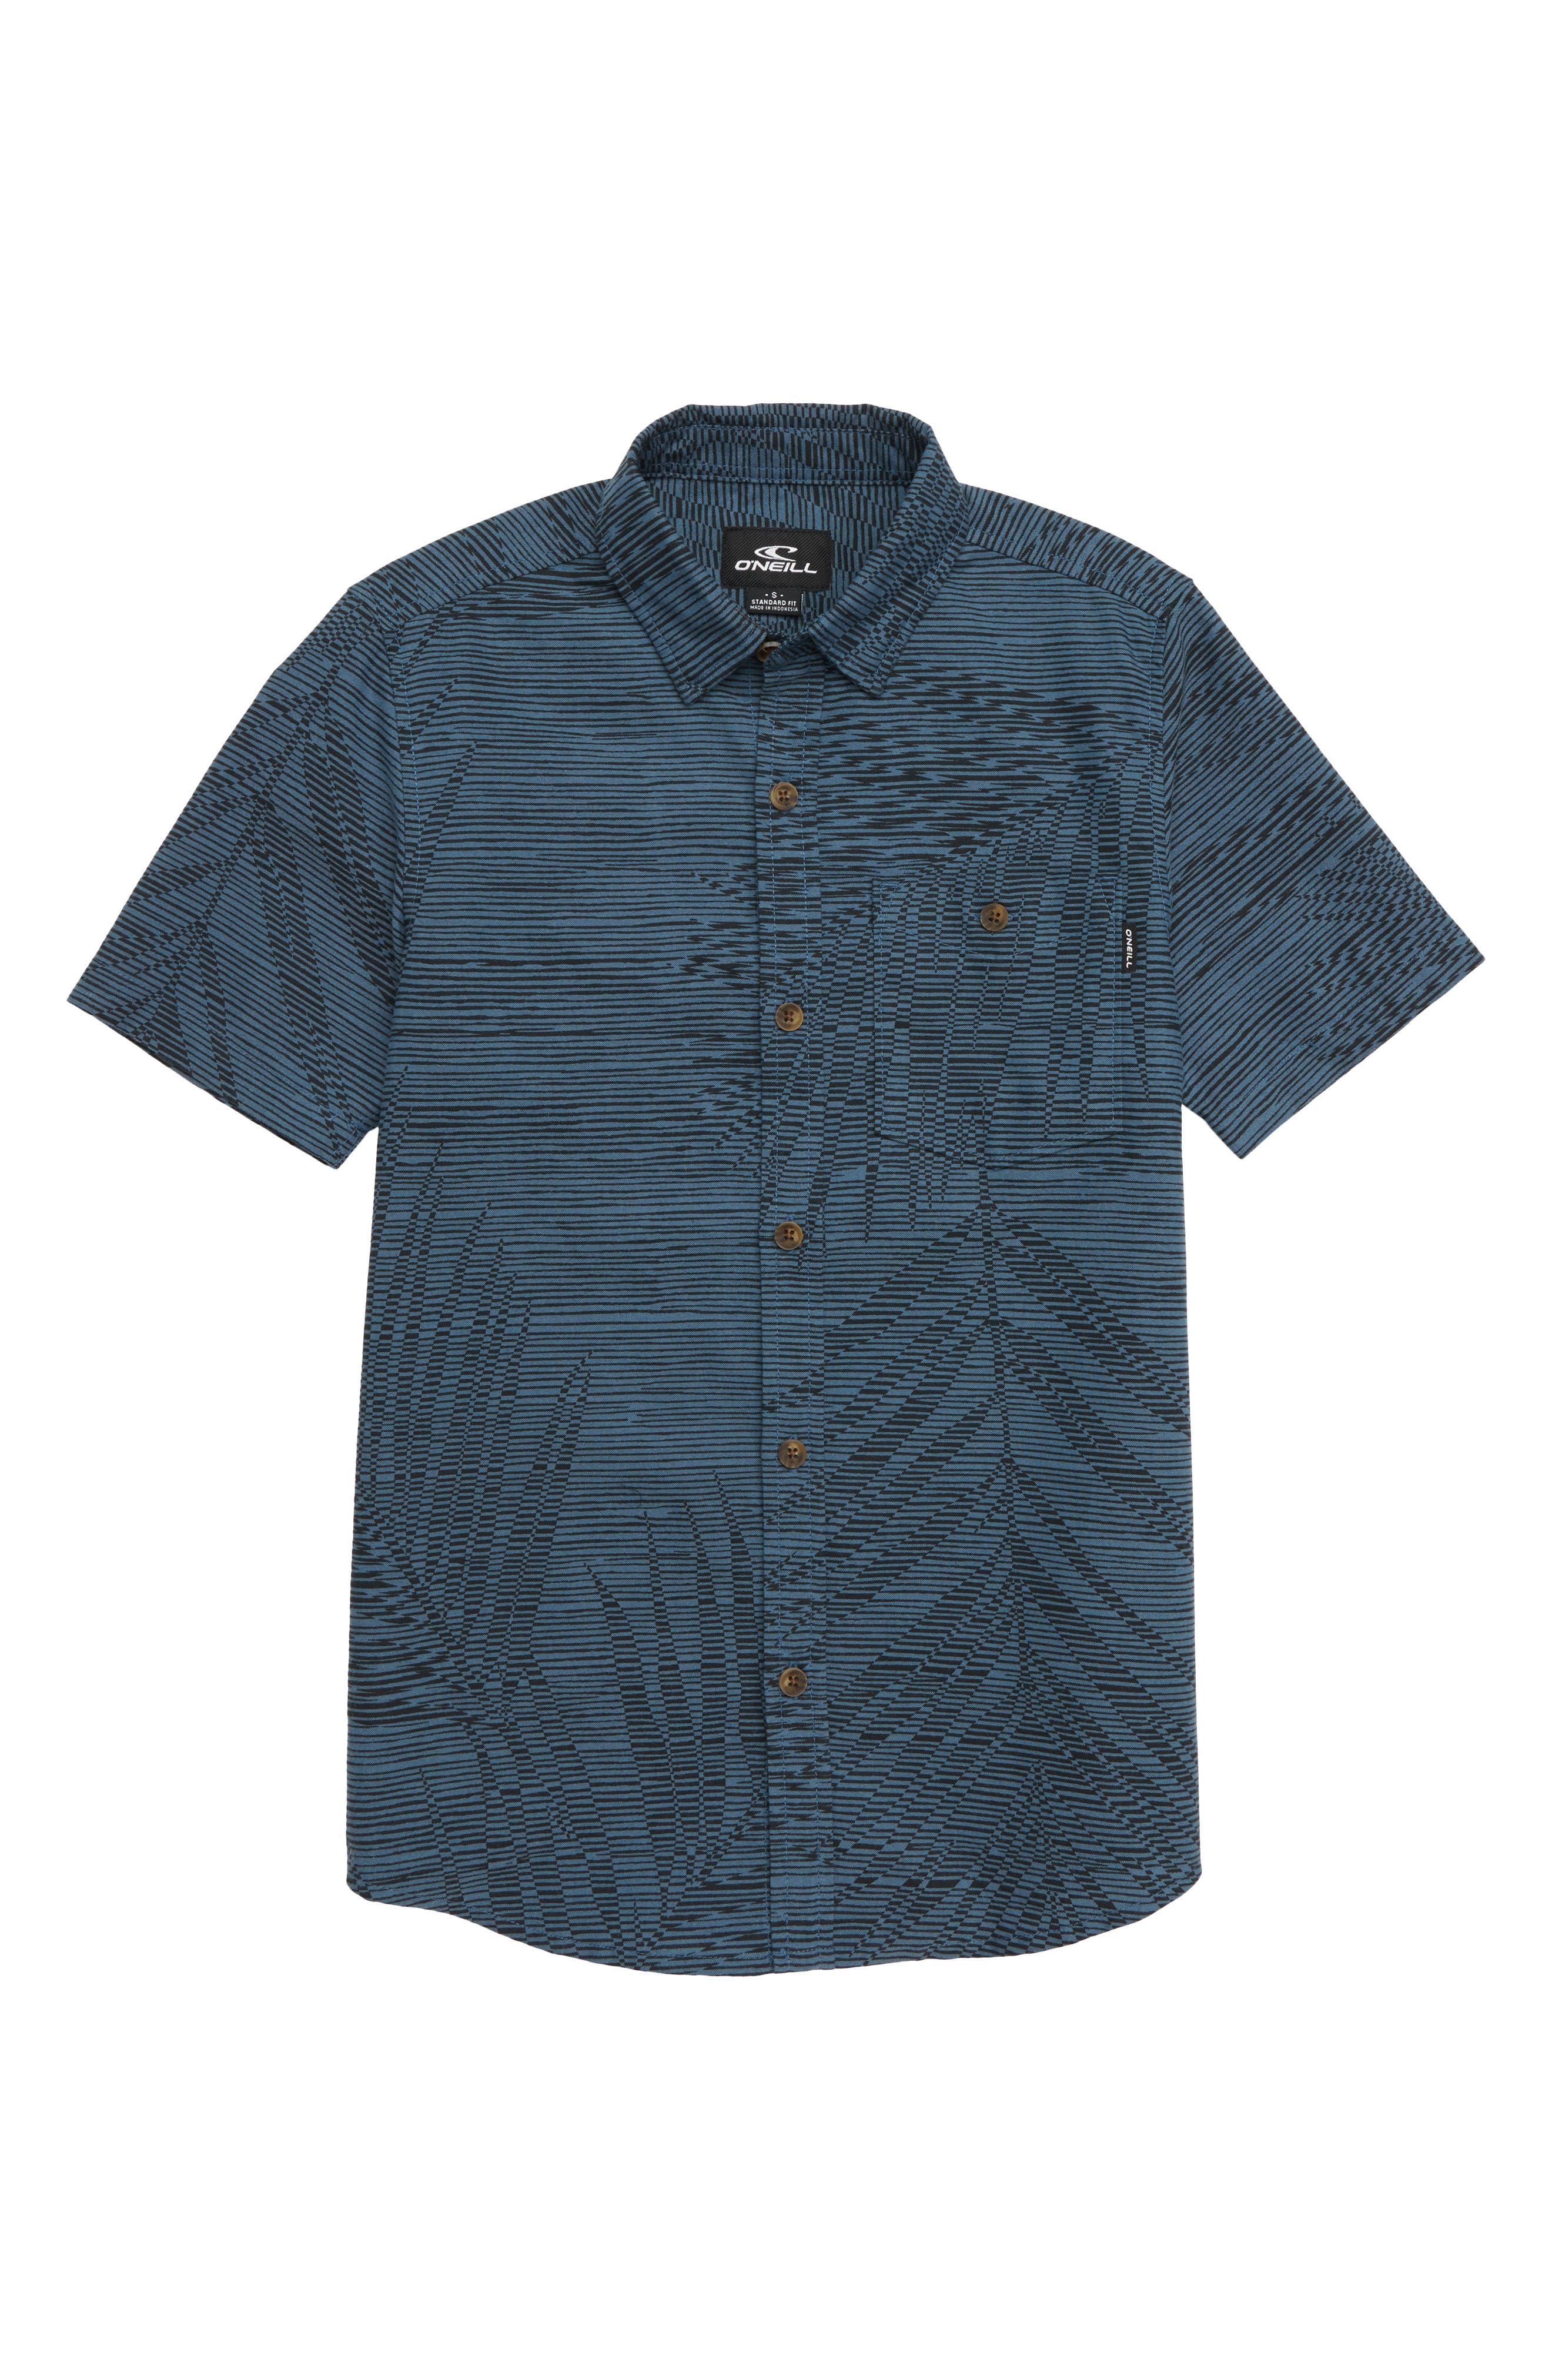 Fronzarelli Woven Shirt,                             Main thumbnail 1, color,                             404